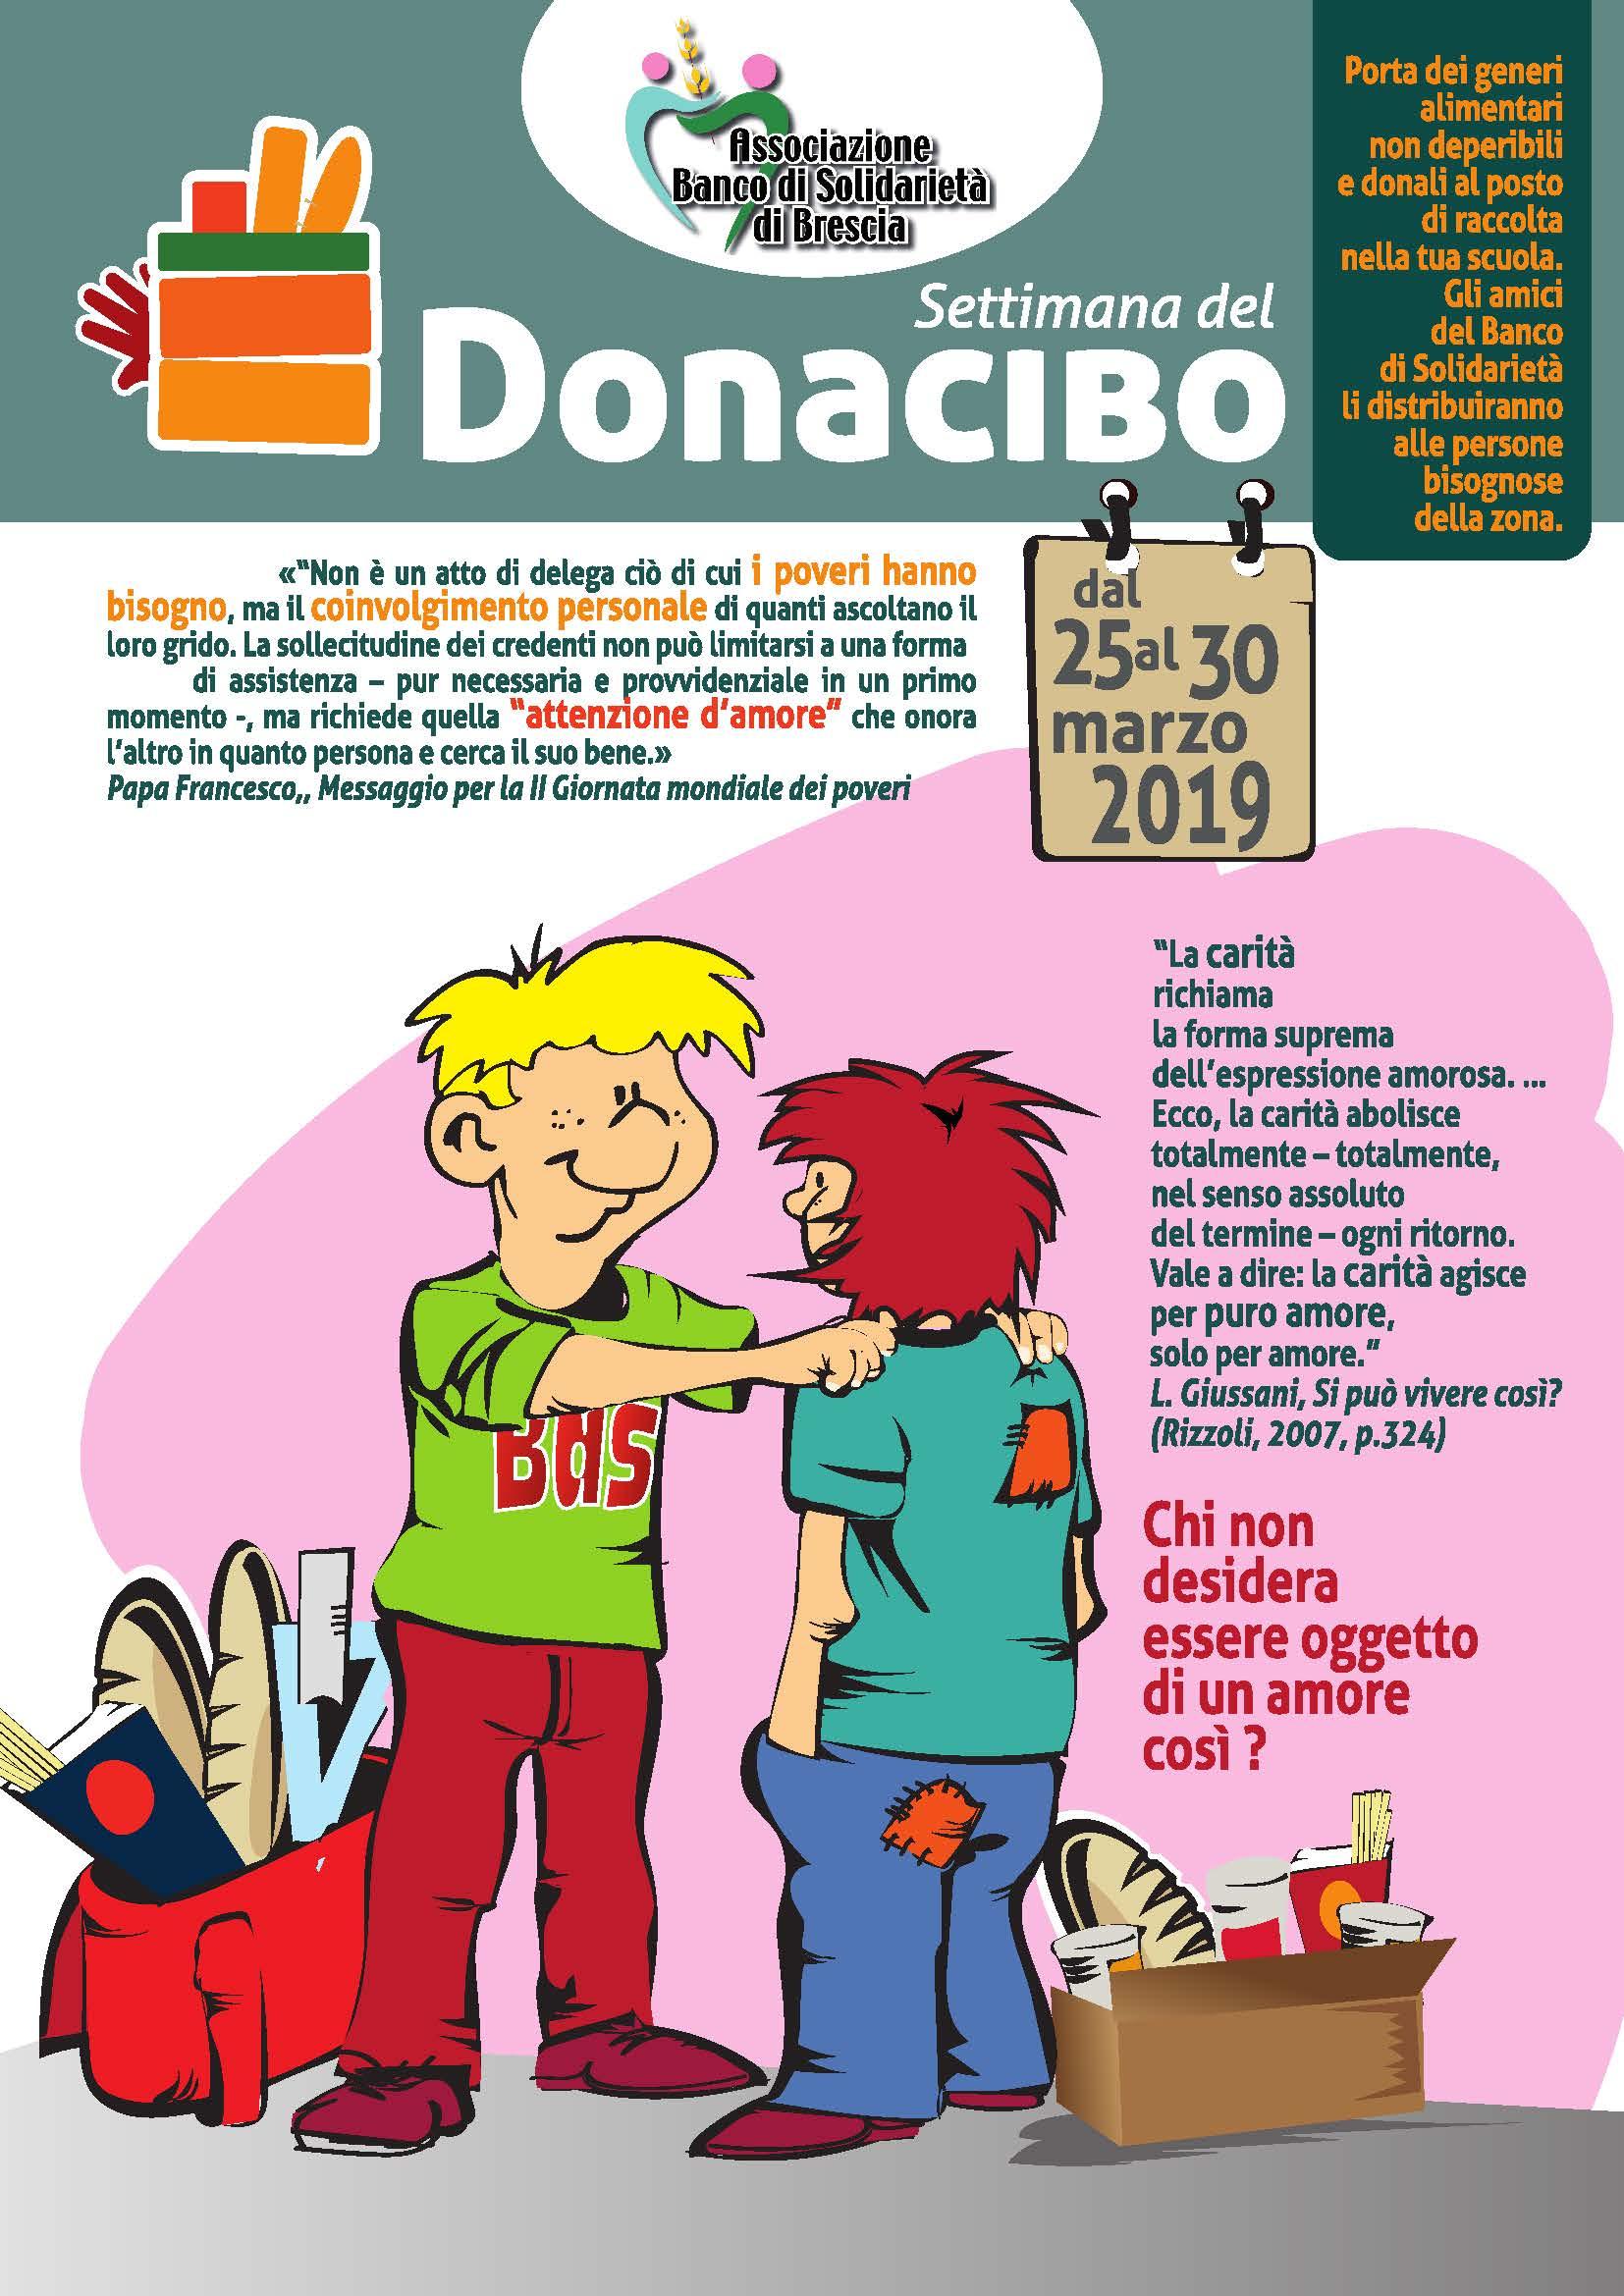 Donacibo.jpg.JPG